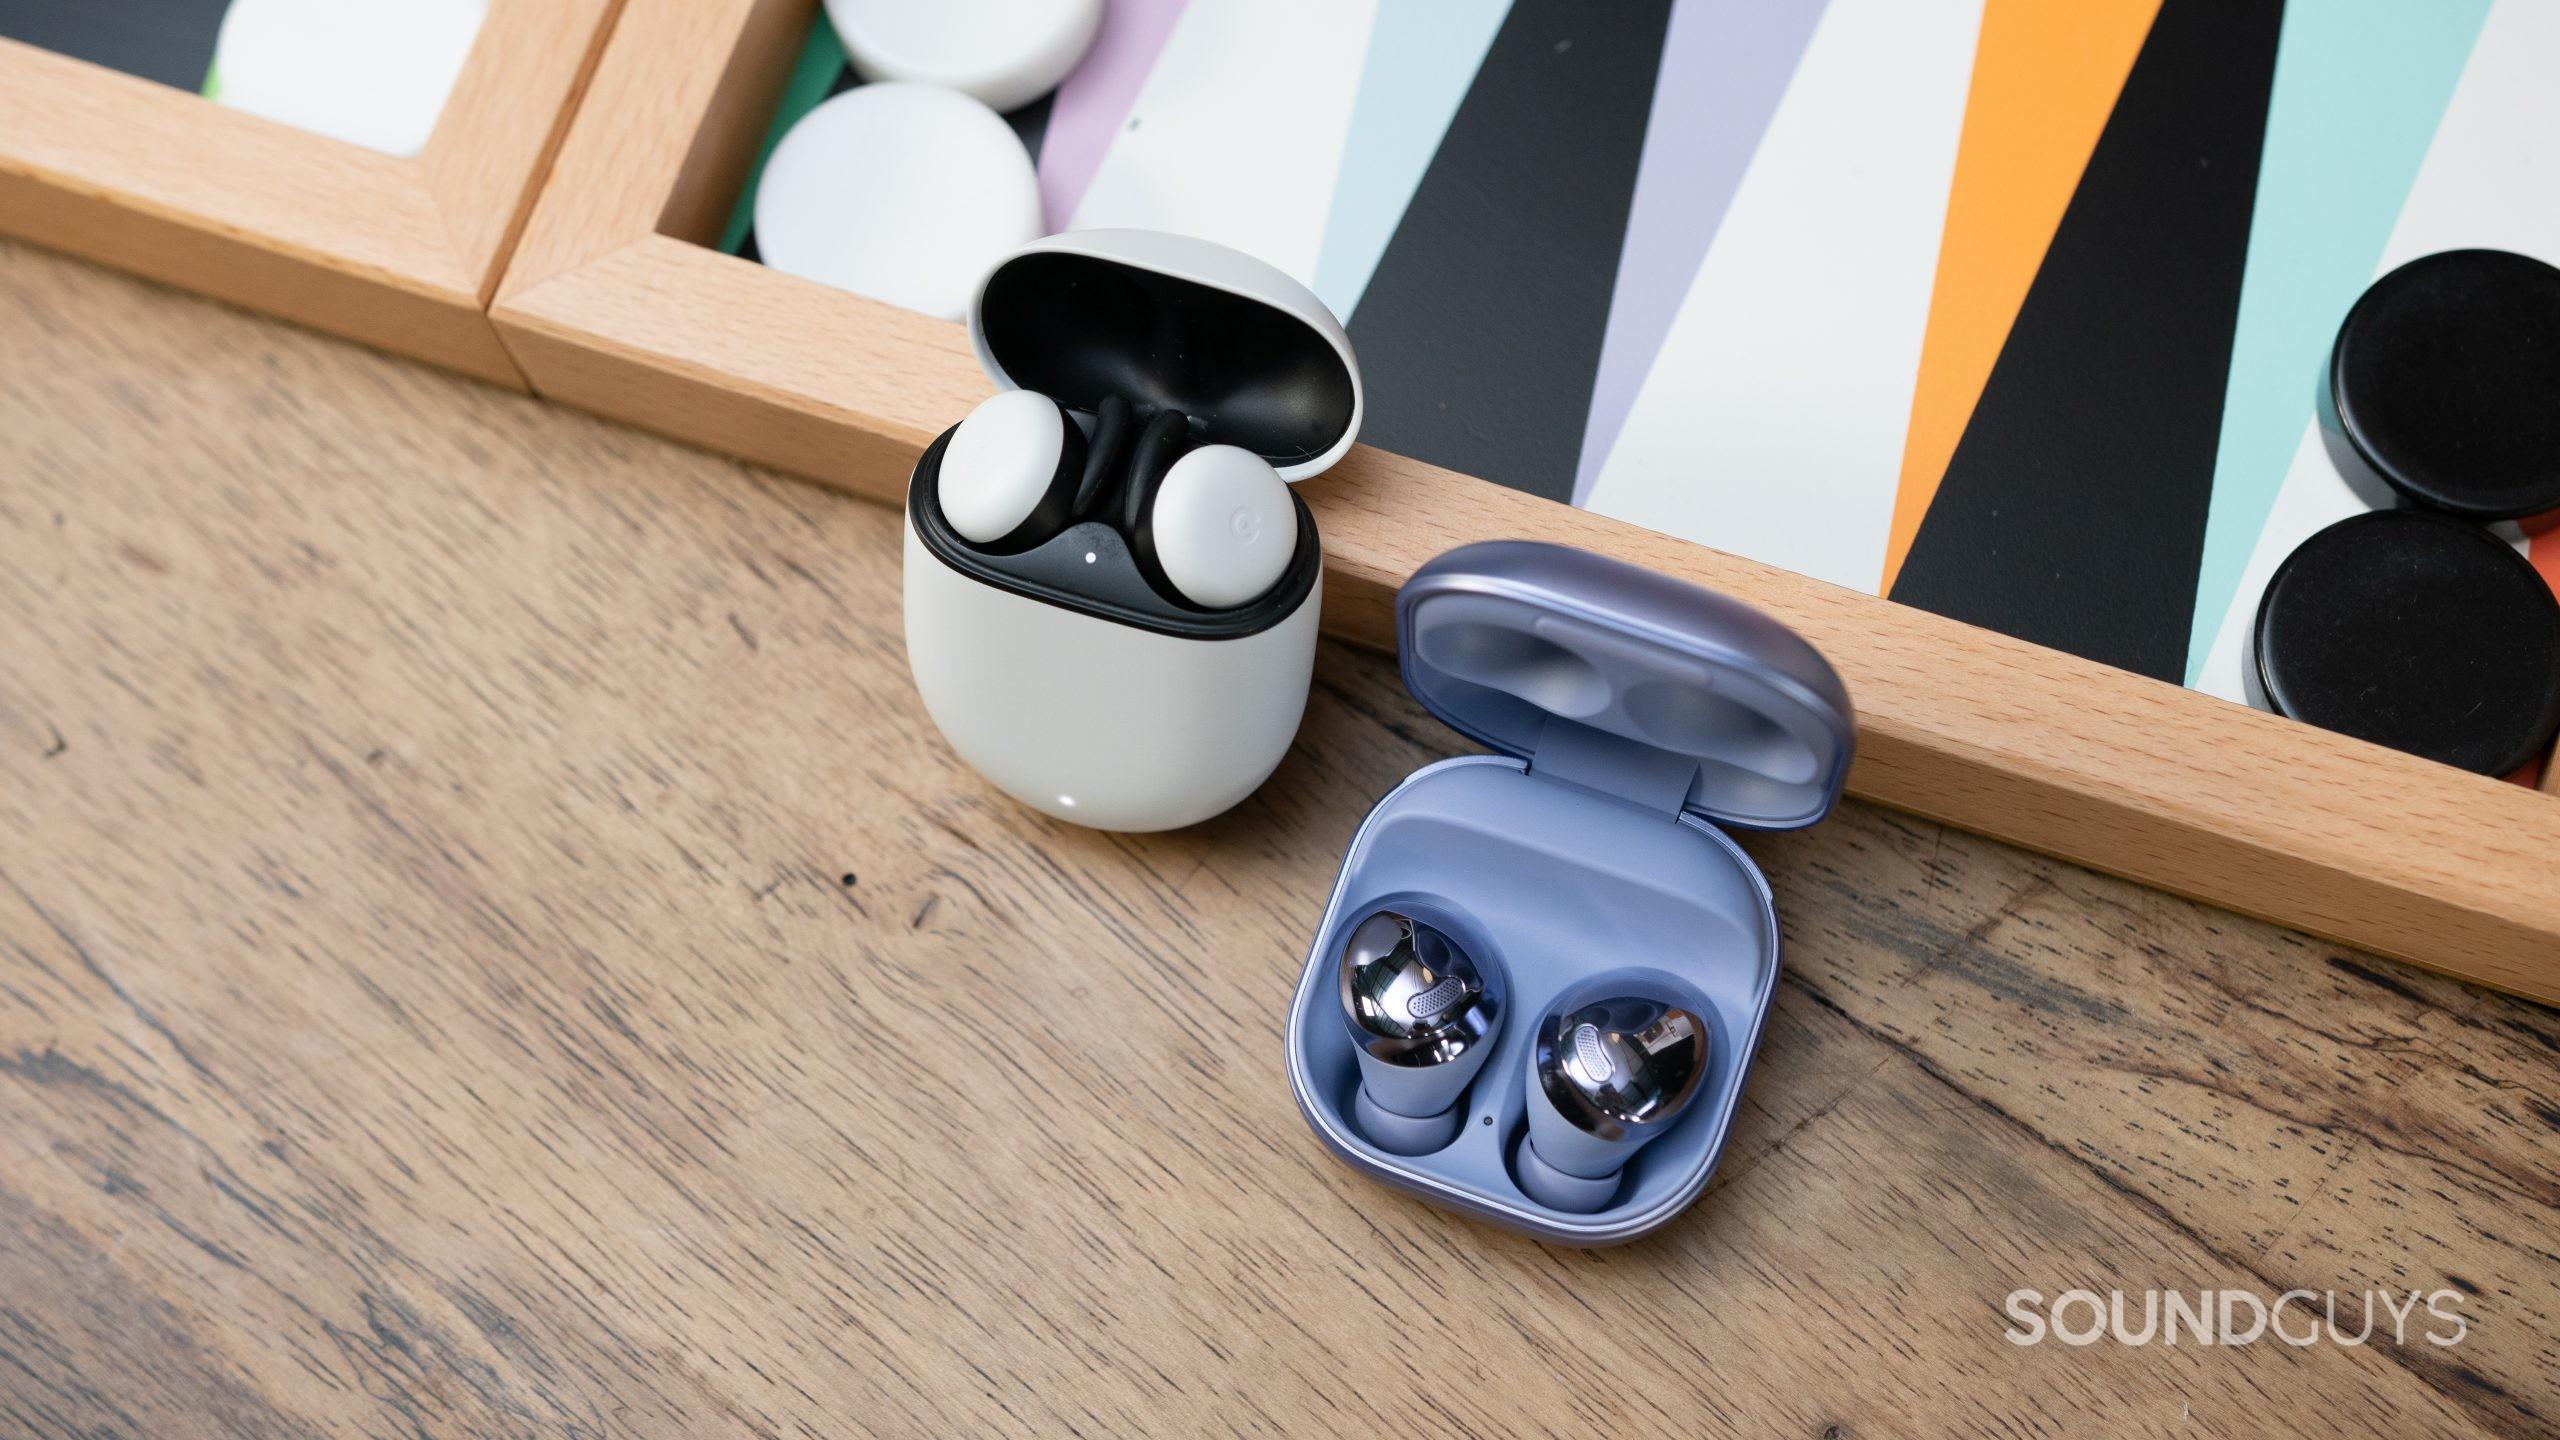 Best True Wireless Earbuds Of 2021 Soundguys